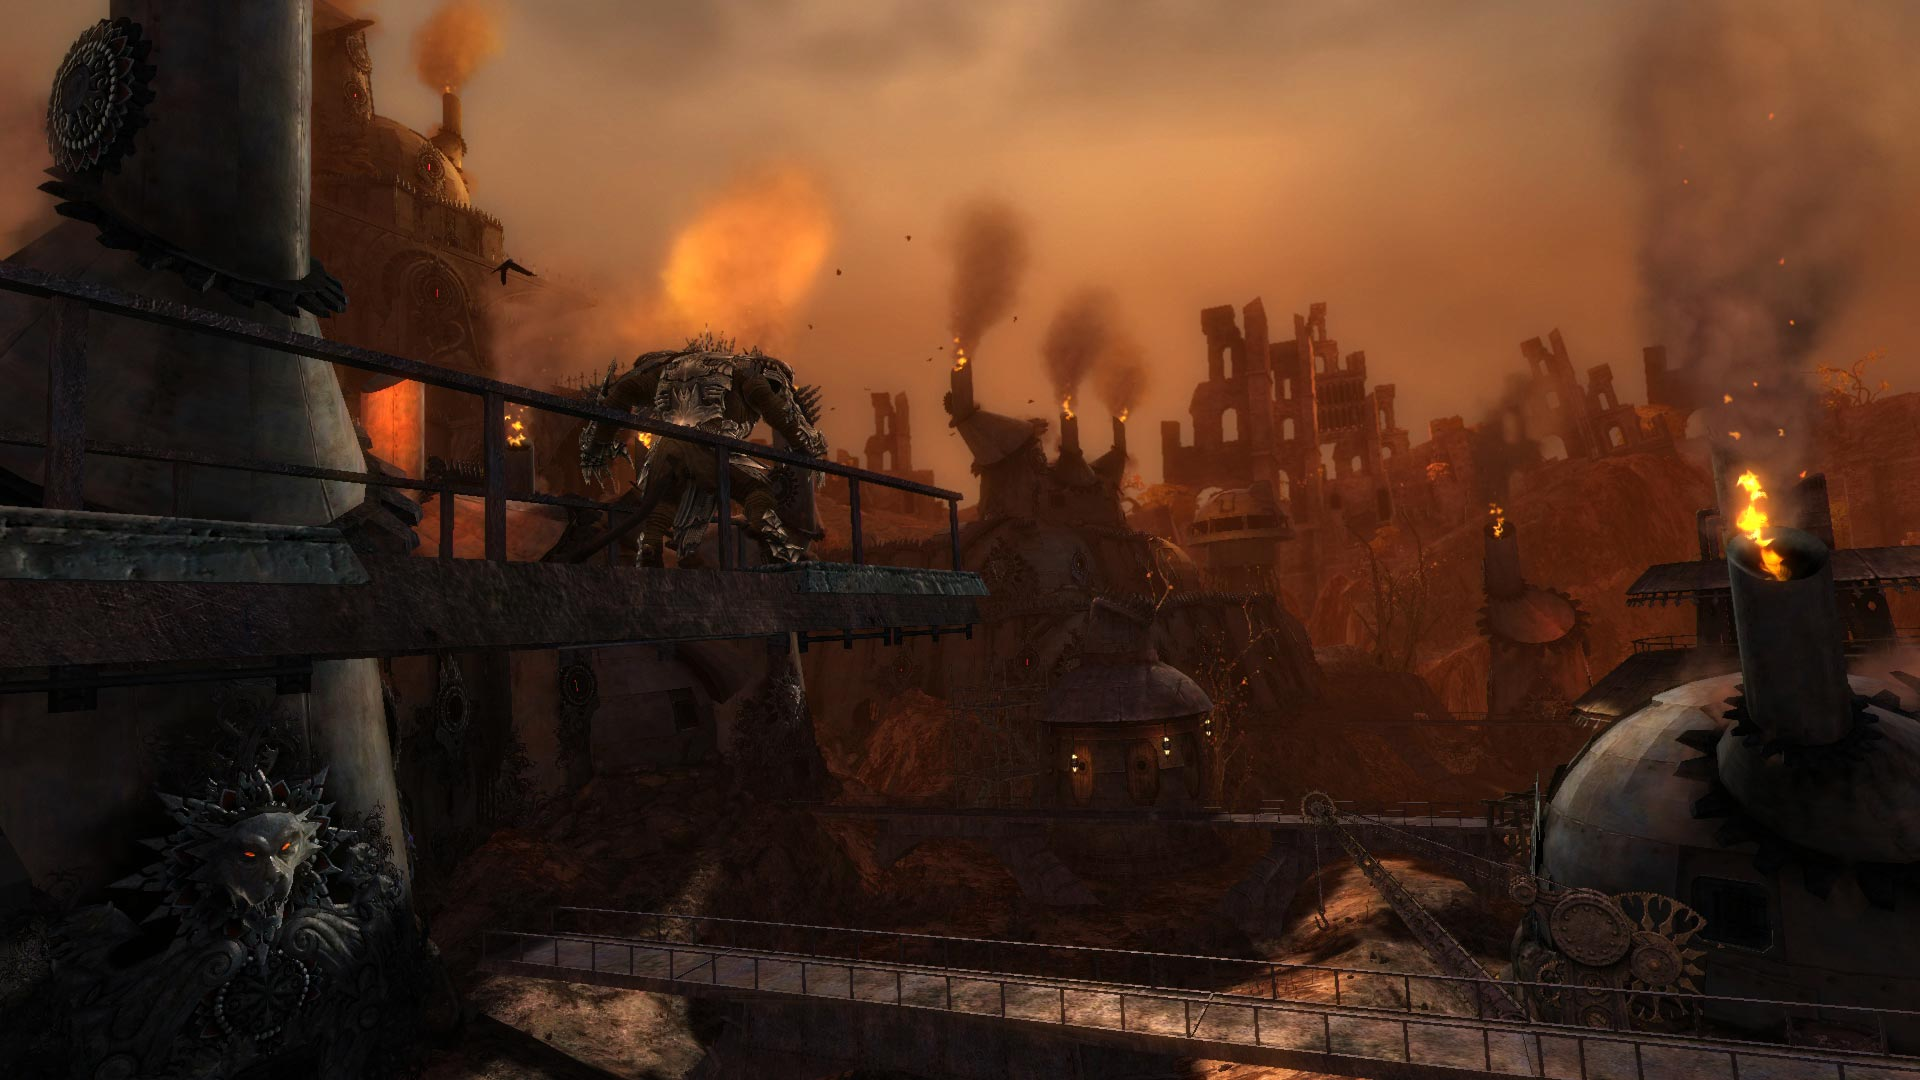 Guild Wars 2 Key (Digital Deluxe Edition) Screenshot 2. Guild Wars 2